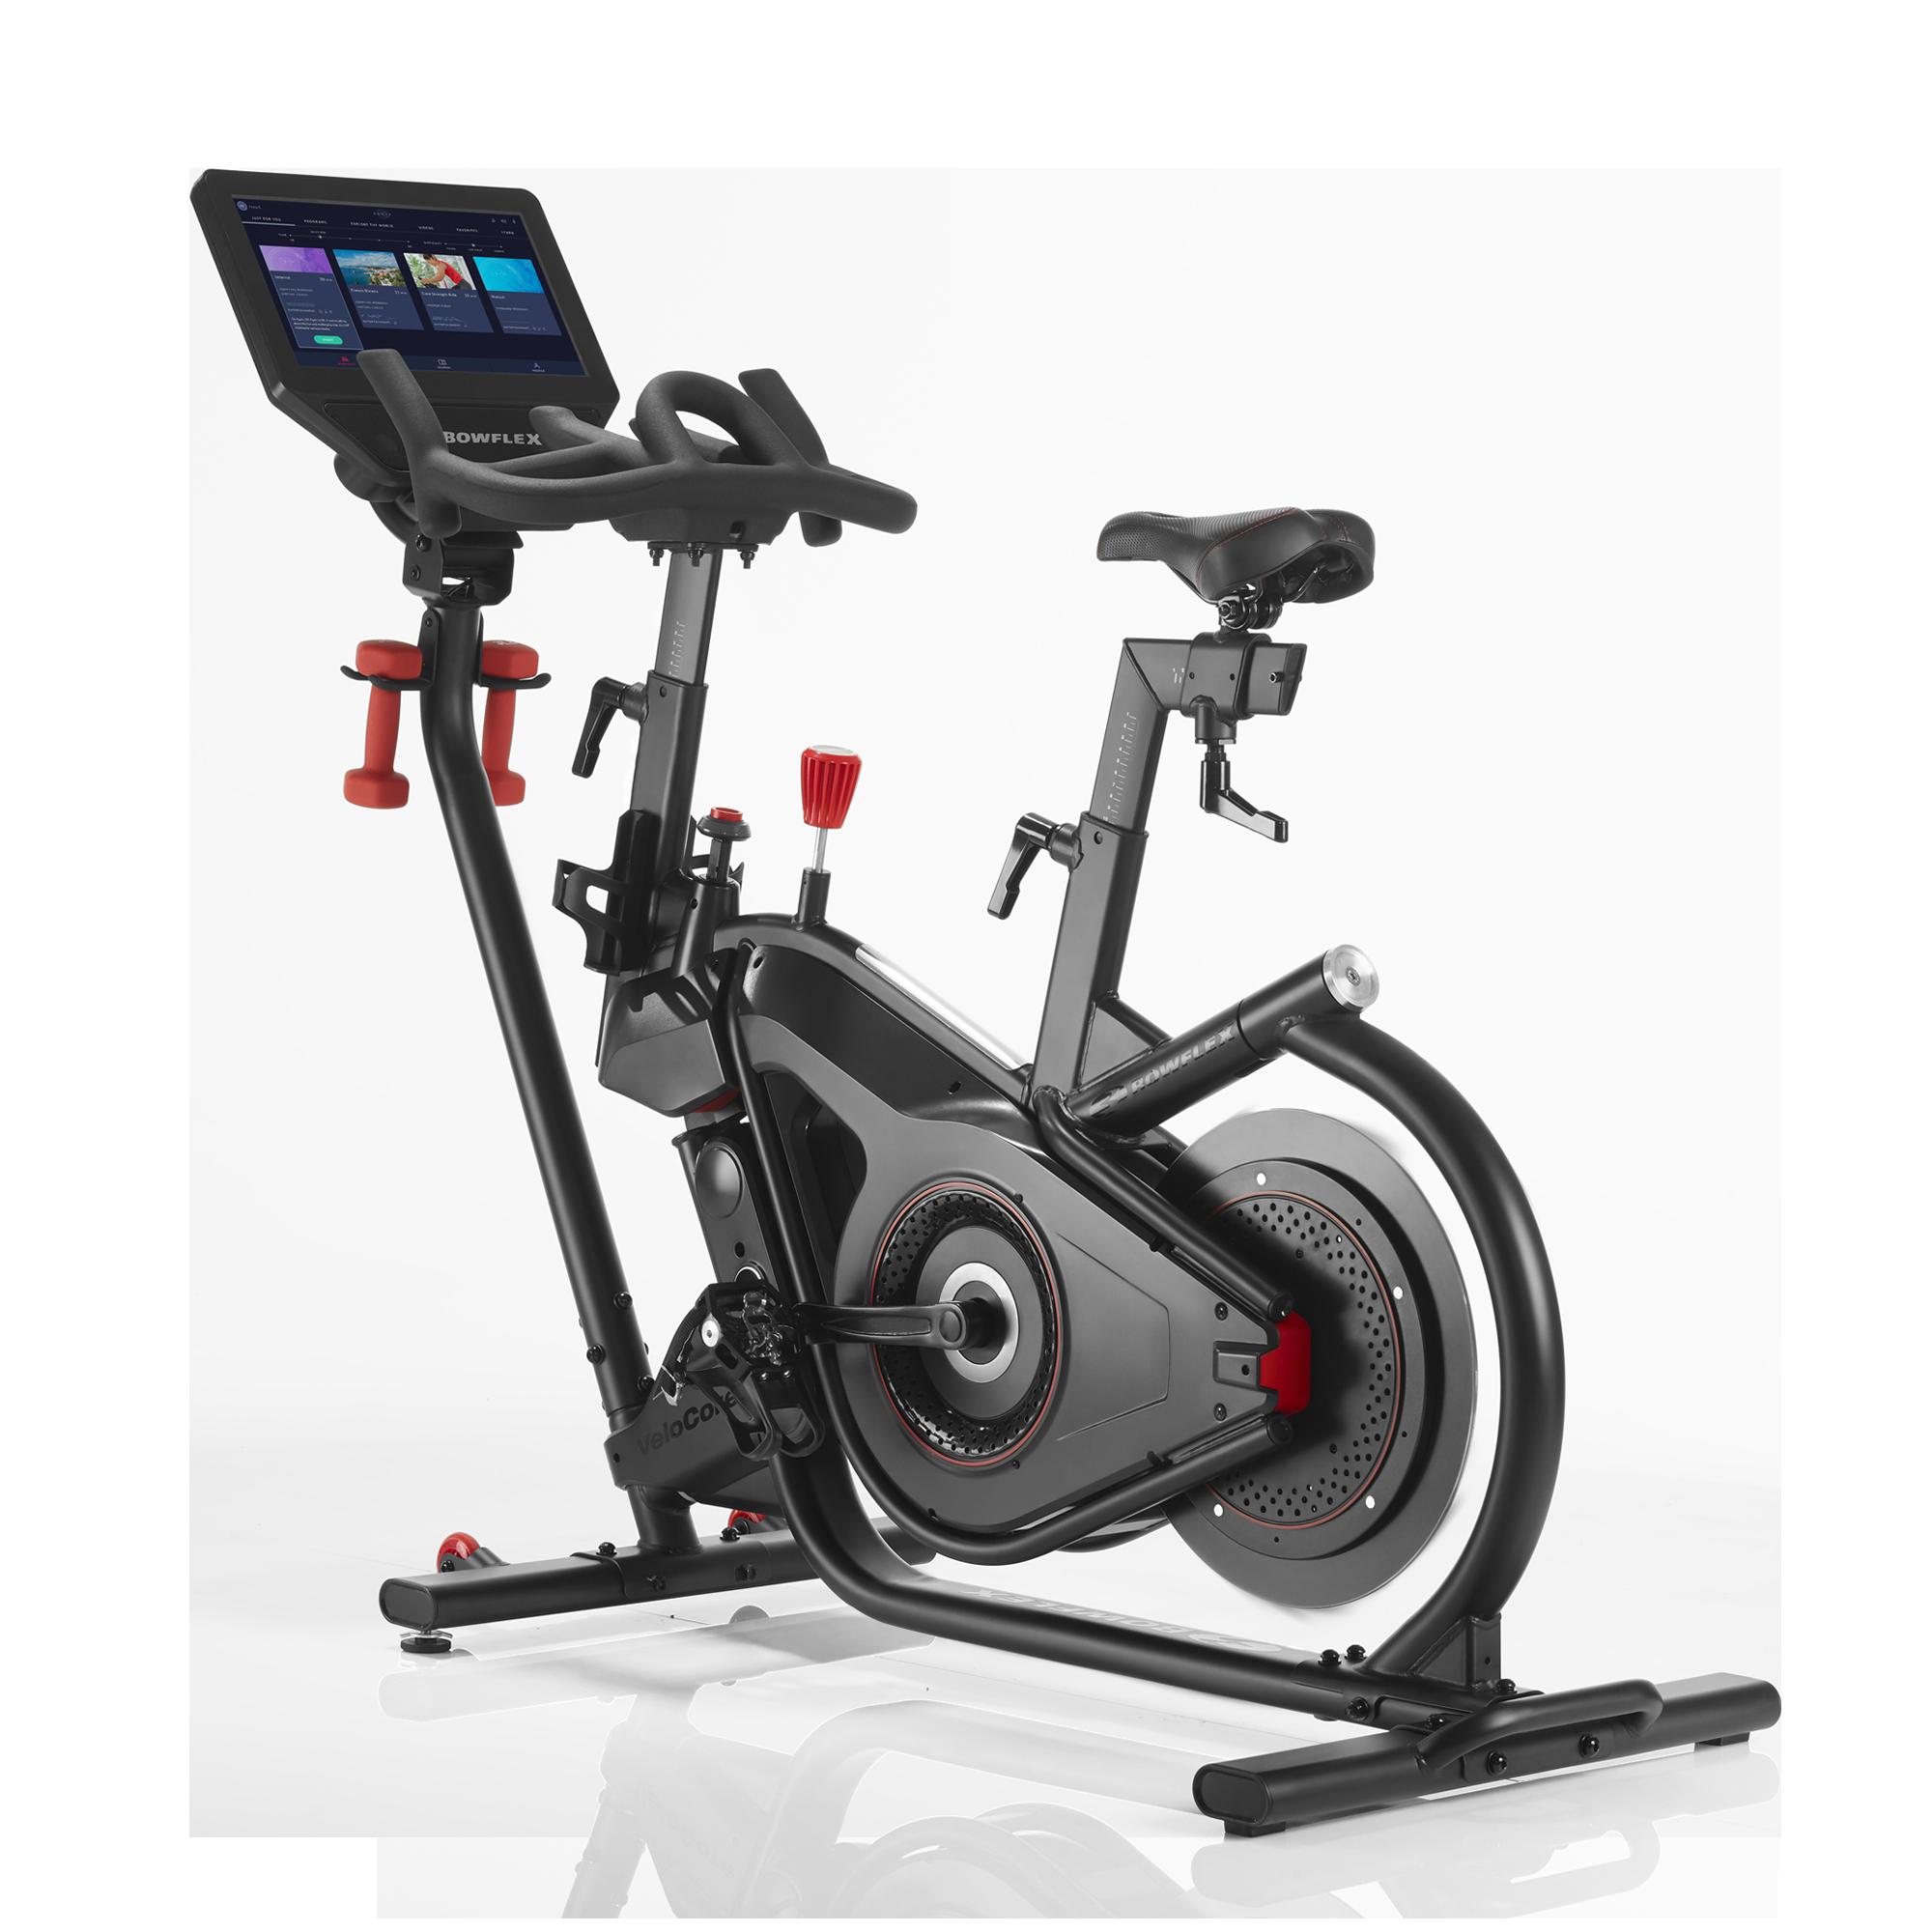 Velocore Bike The Indoor Exercise Bike That Leans Bowflex